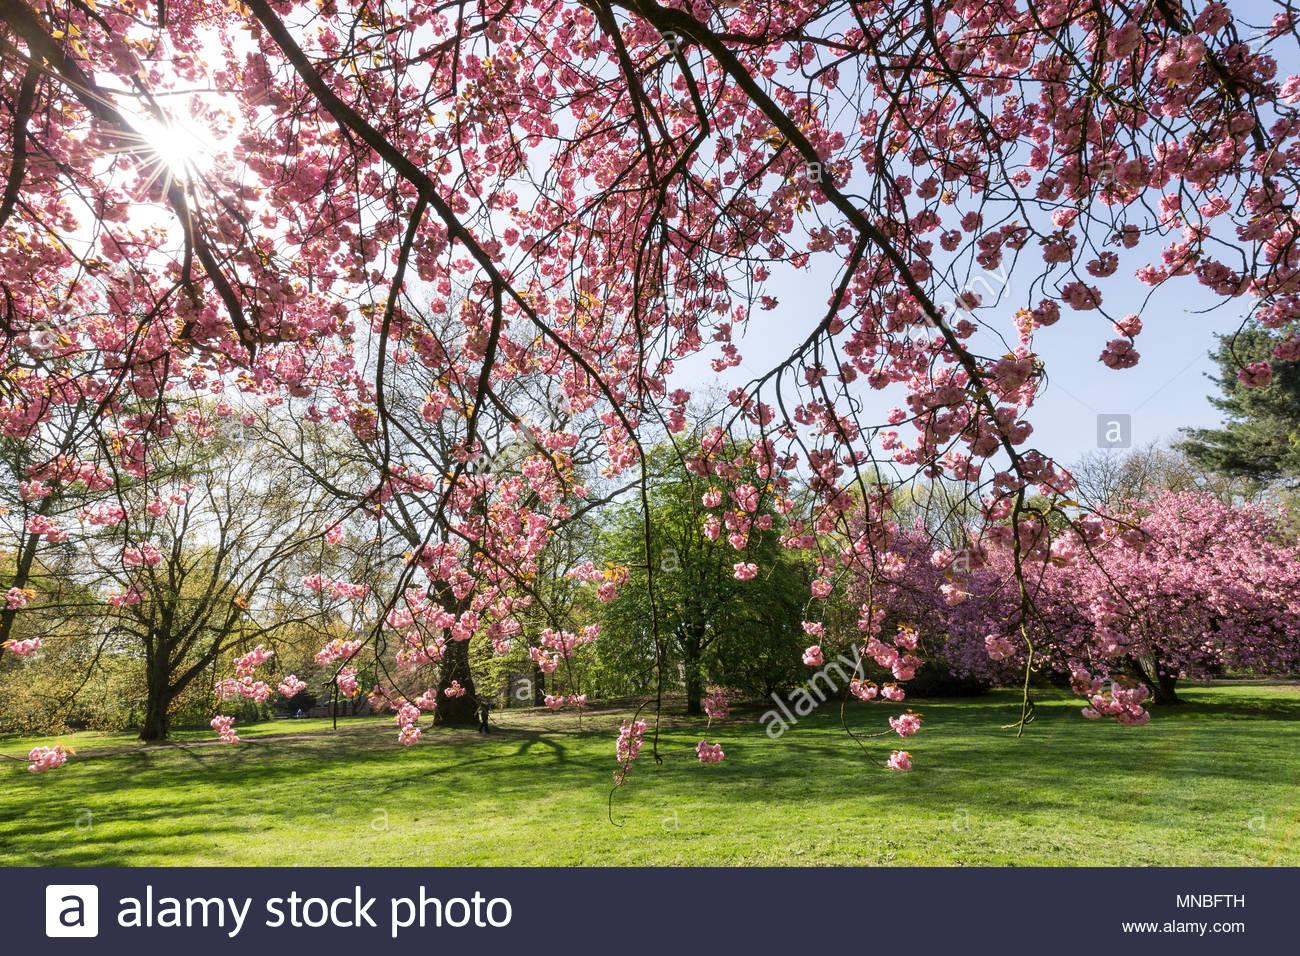 park landscape Japanese cherry tree in full bloom pink vegetation plant blossoming blooming branches twig nature spring season Boeninger Park Duisburg - Stock Image